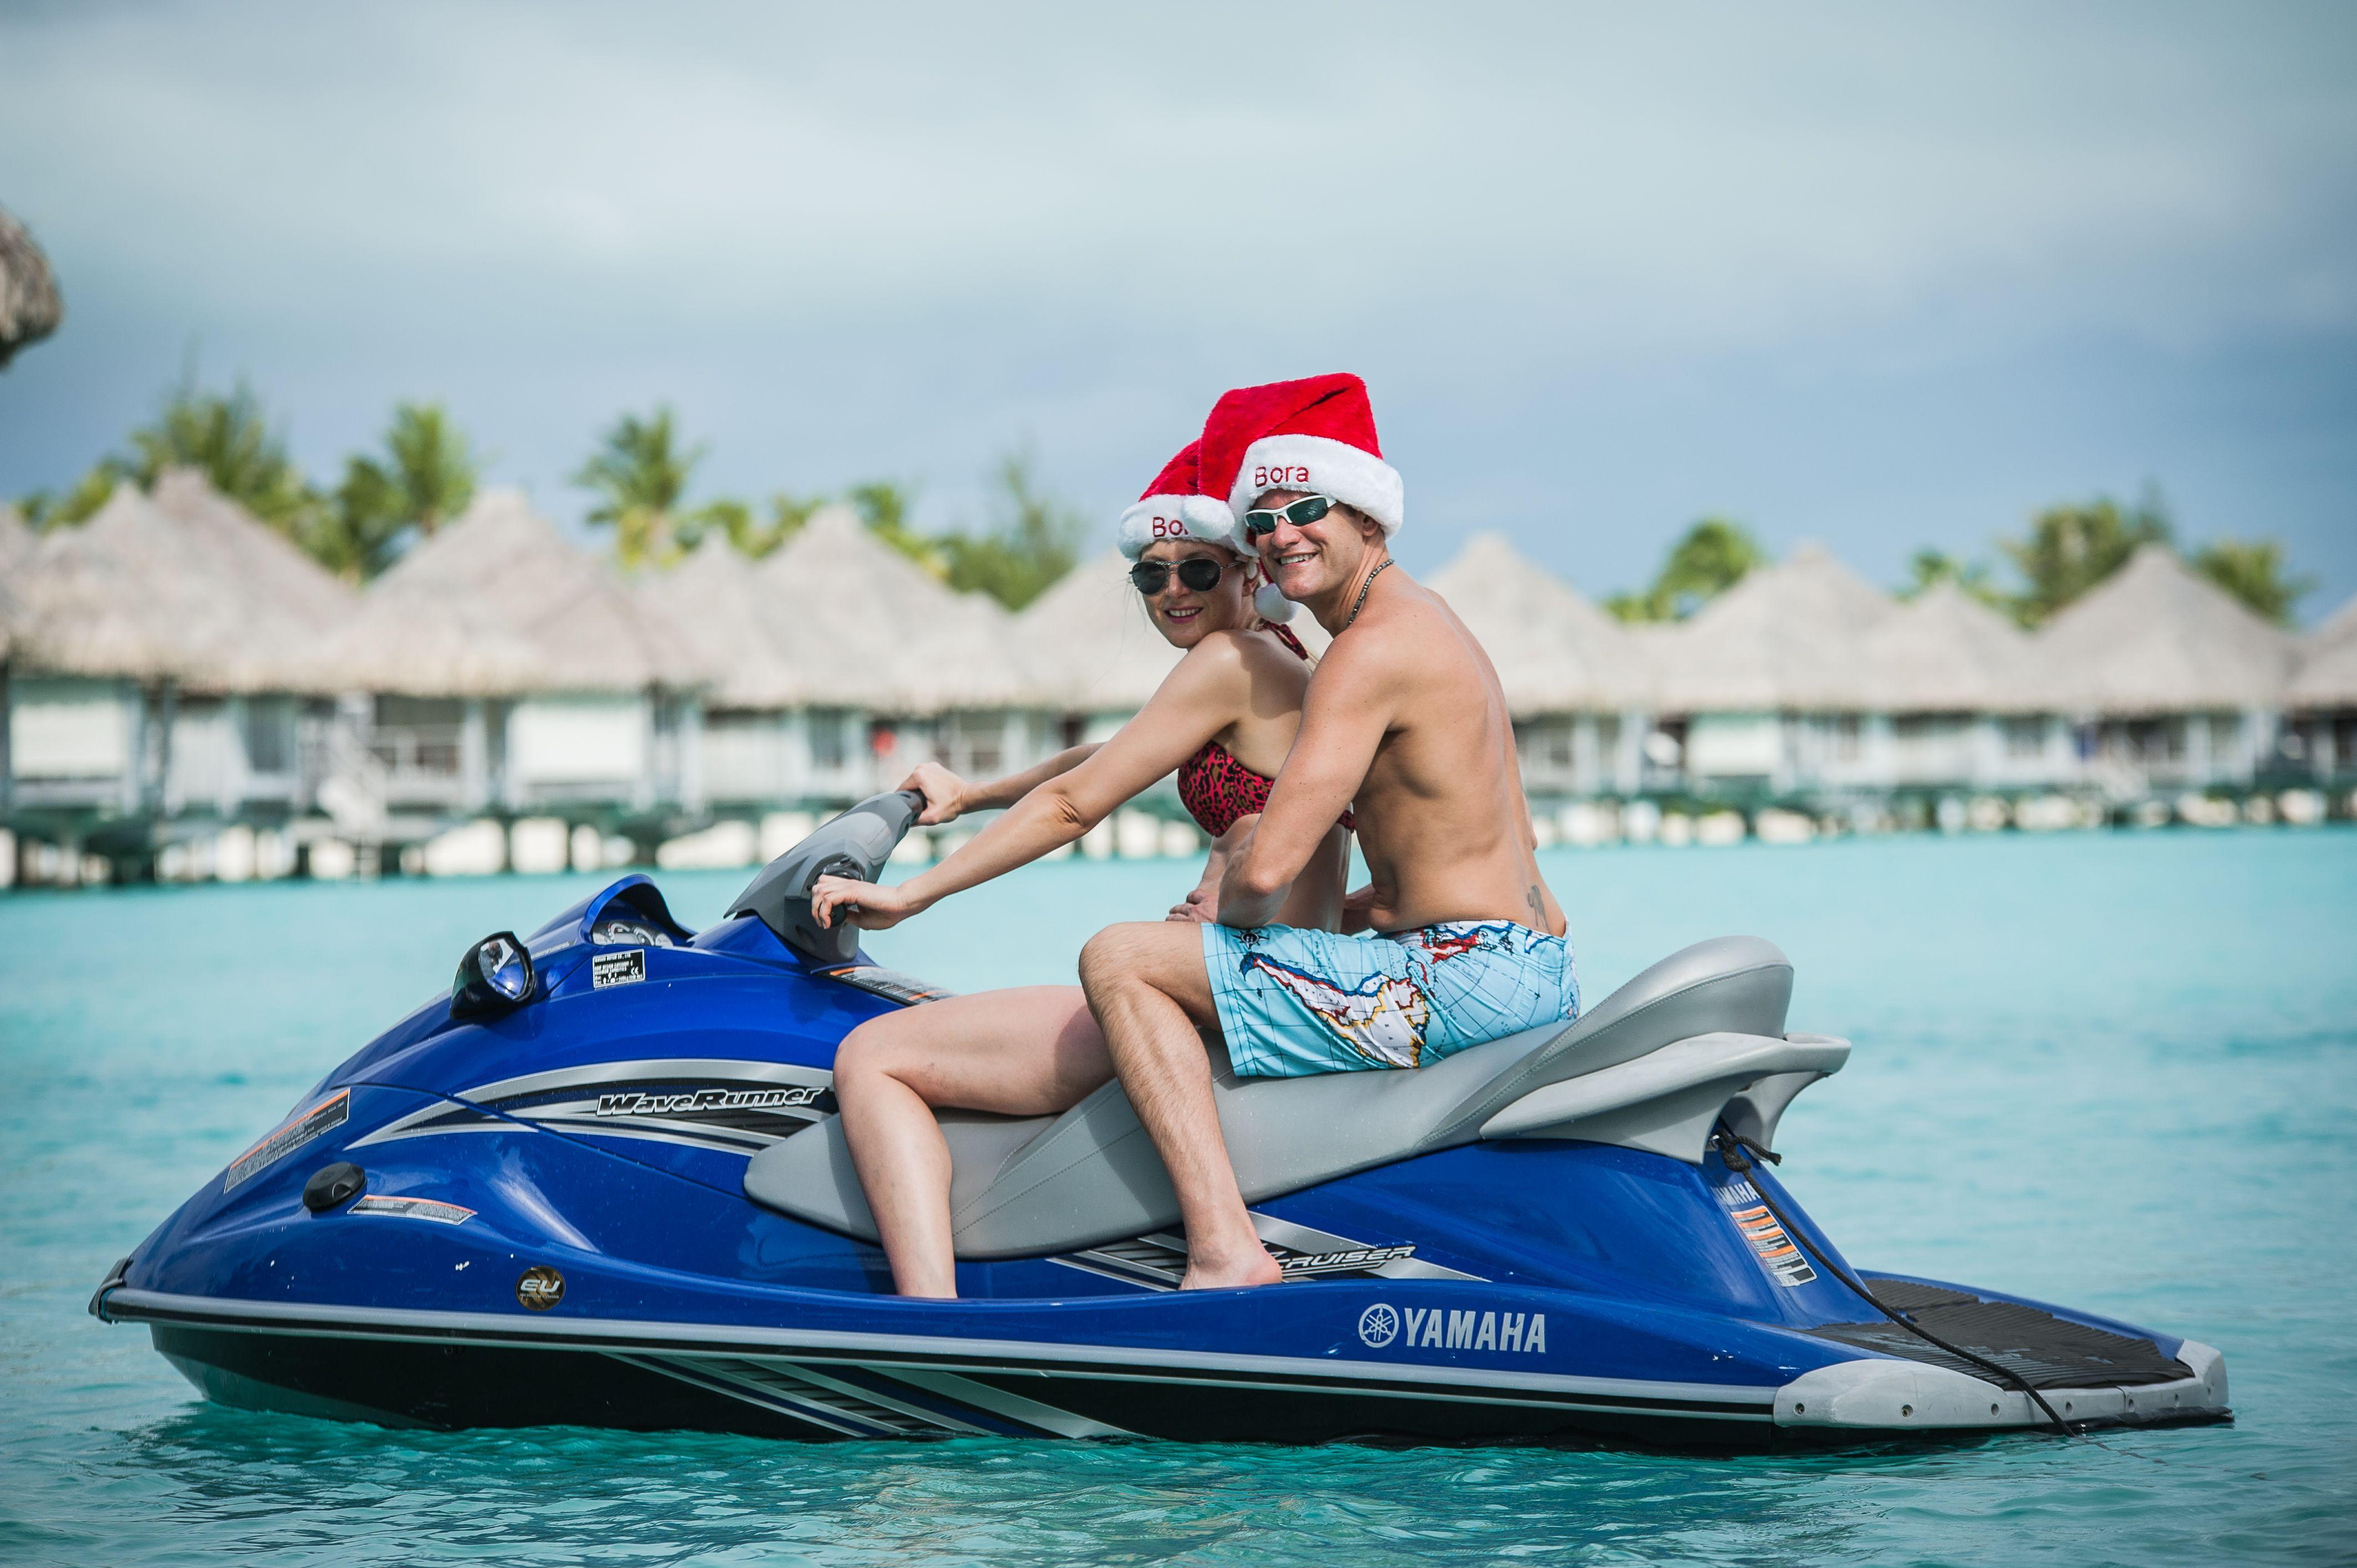 Christmas Jet Skiing In Bora Bora With Cassandra Sean Rox At The St Regis Bora Bora Resort Https Www Rox Bora Bora Resorts Bora Bora Bora Bora Honeymoon